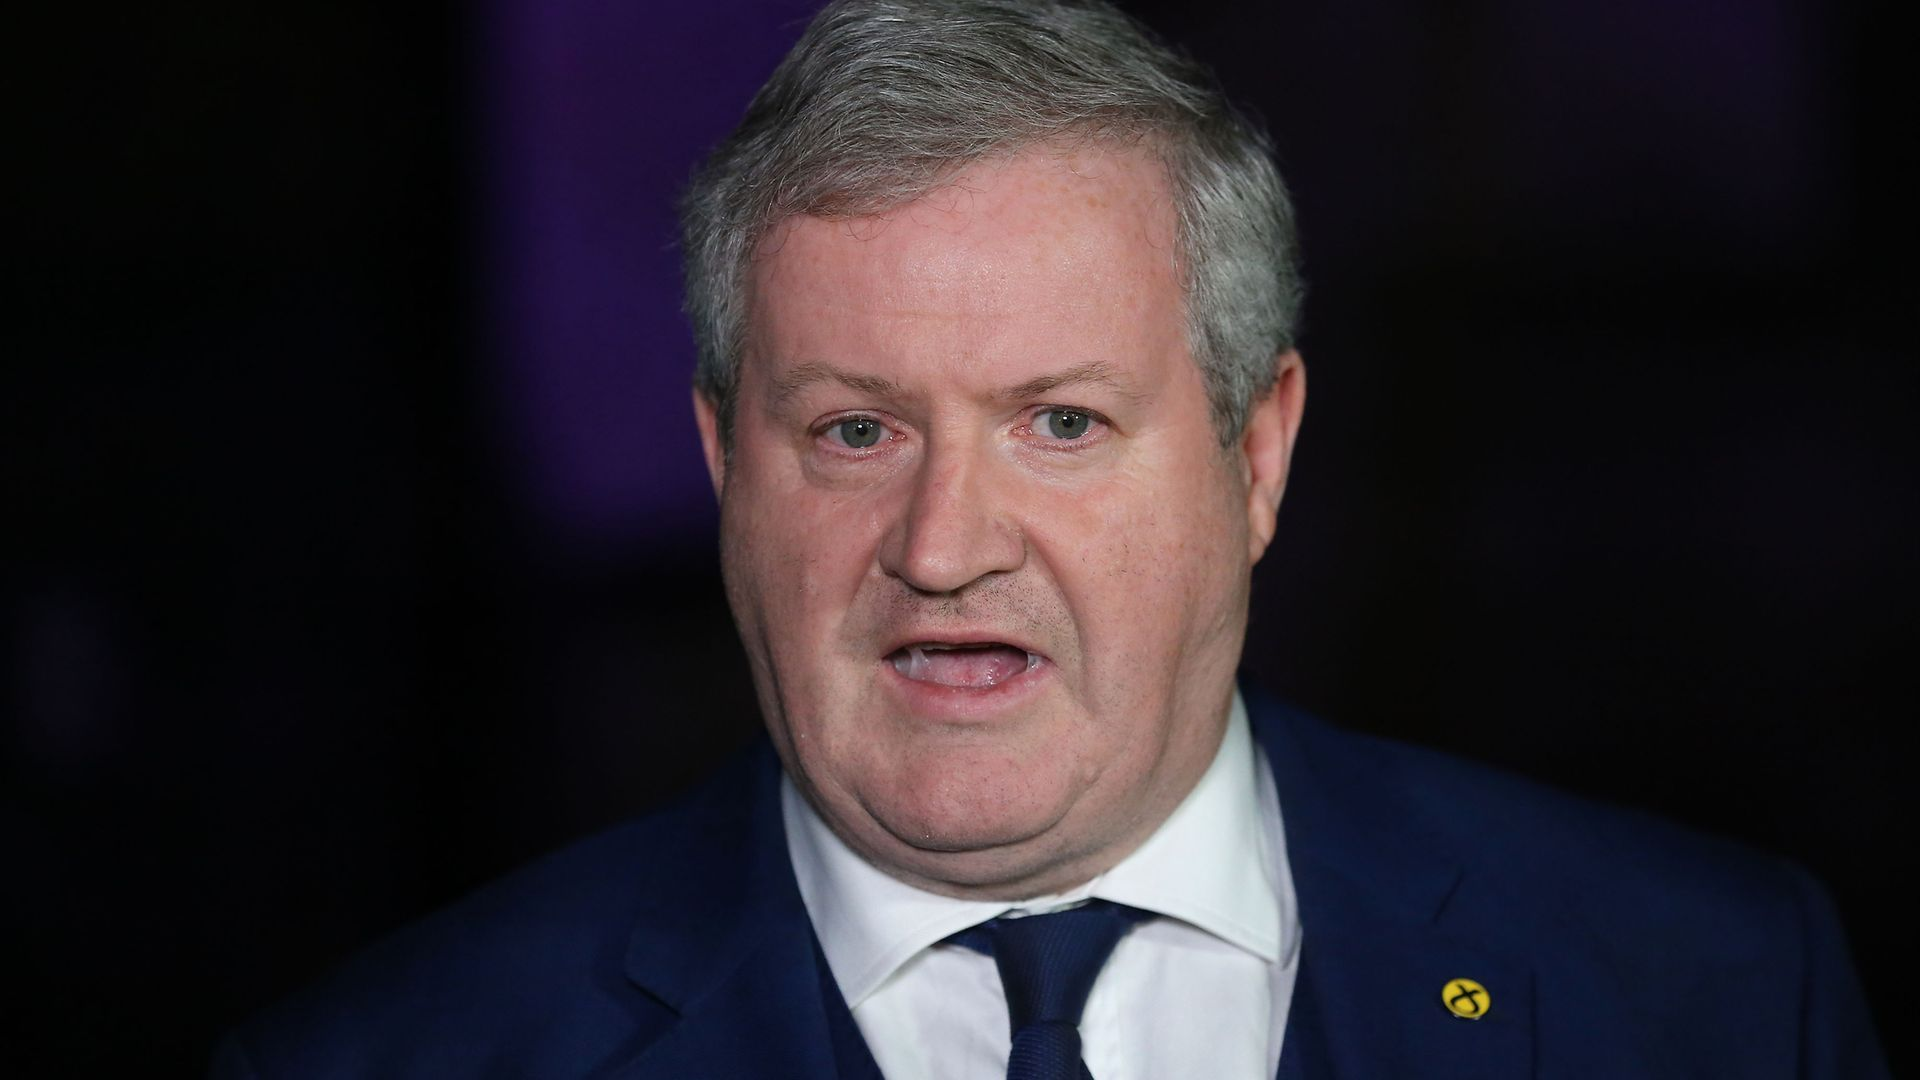 SNP Westminster leader Ian Blackford - Credit: PA